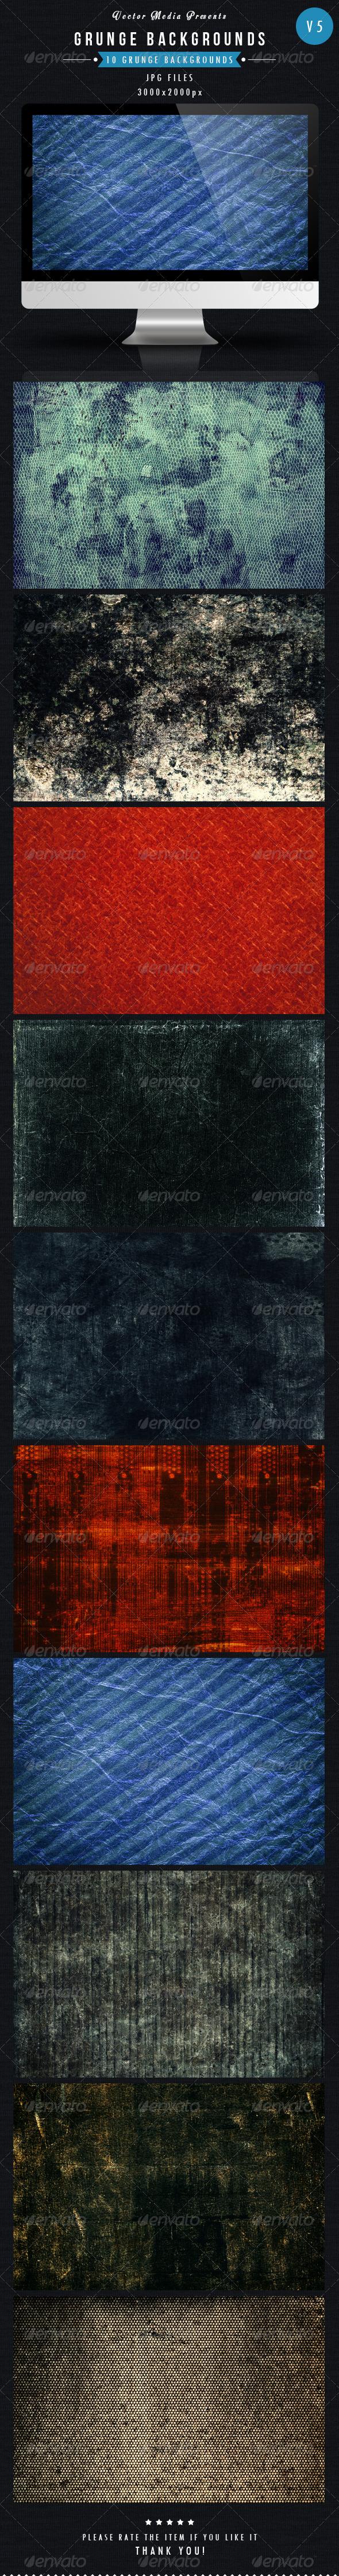 Grunge Backgrounds Vol 5